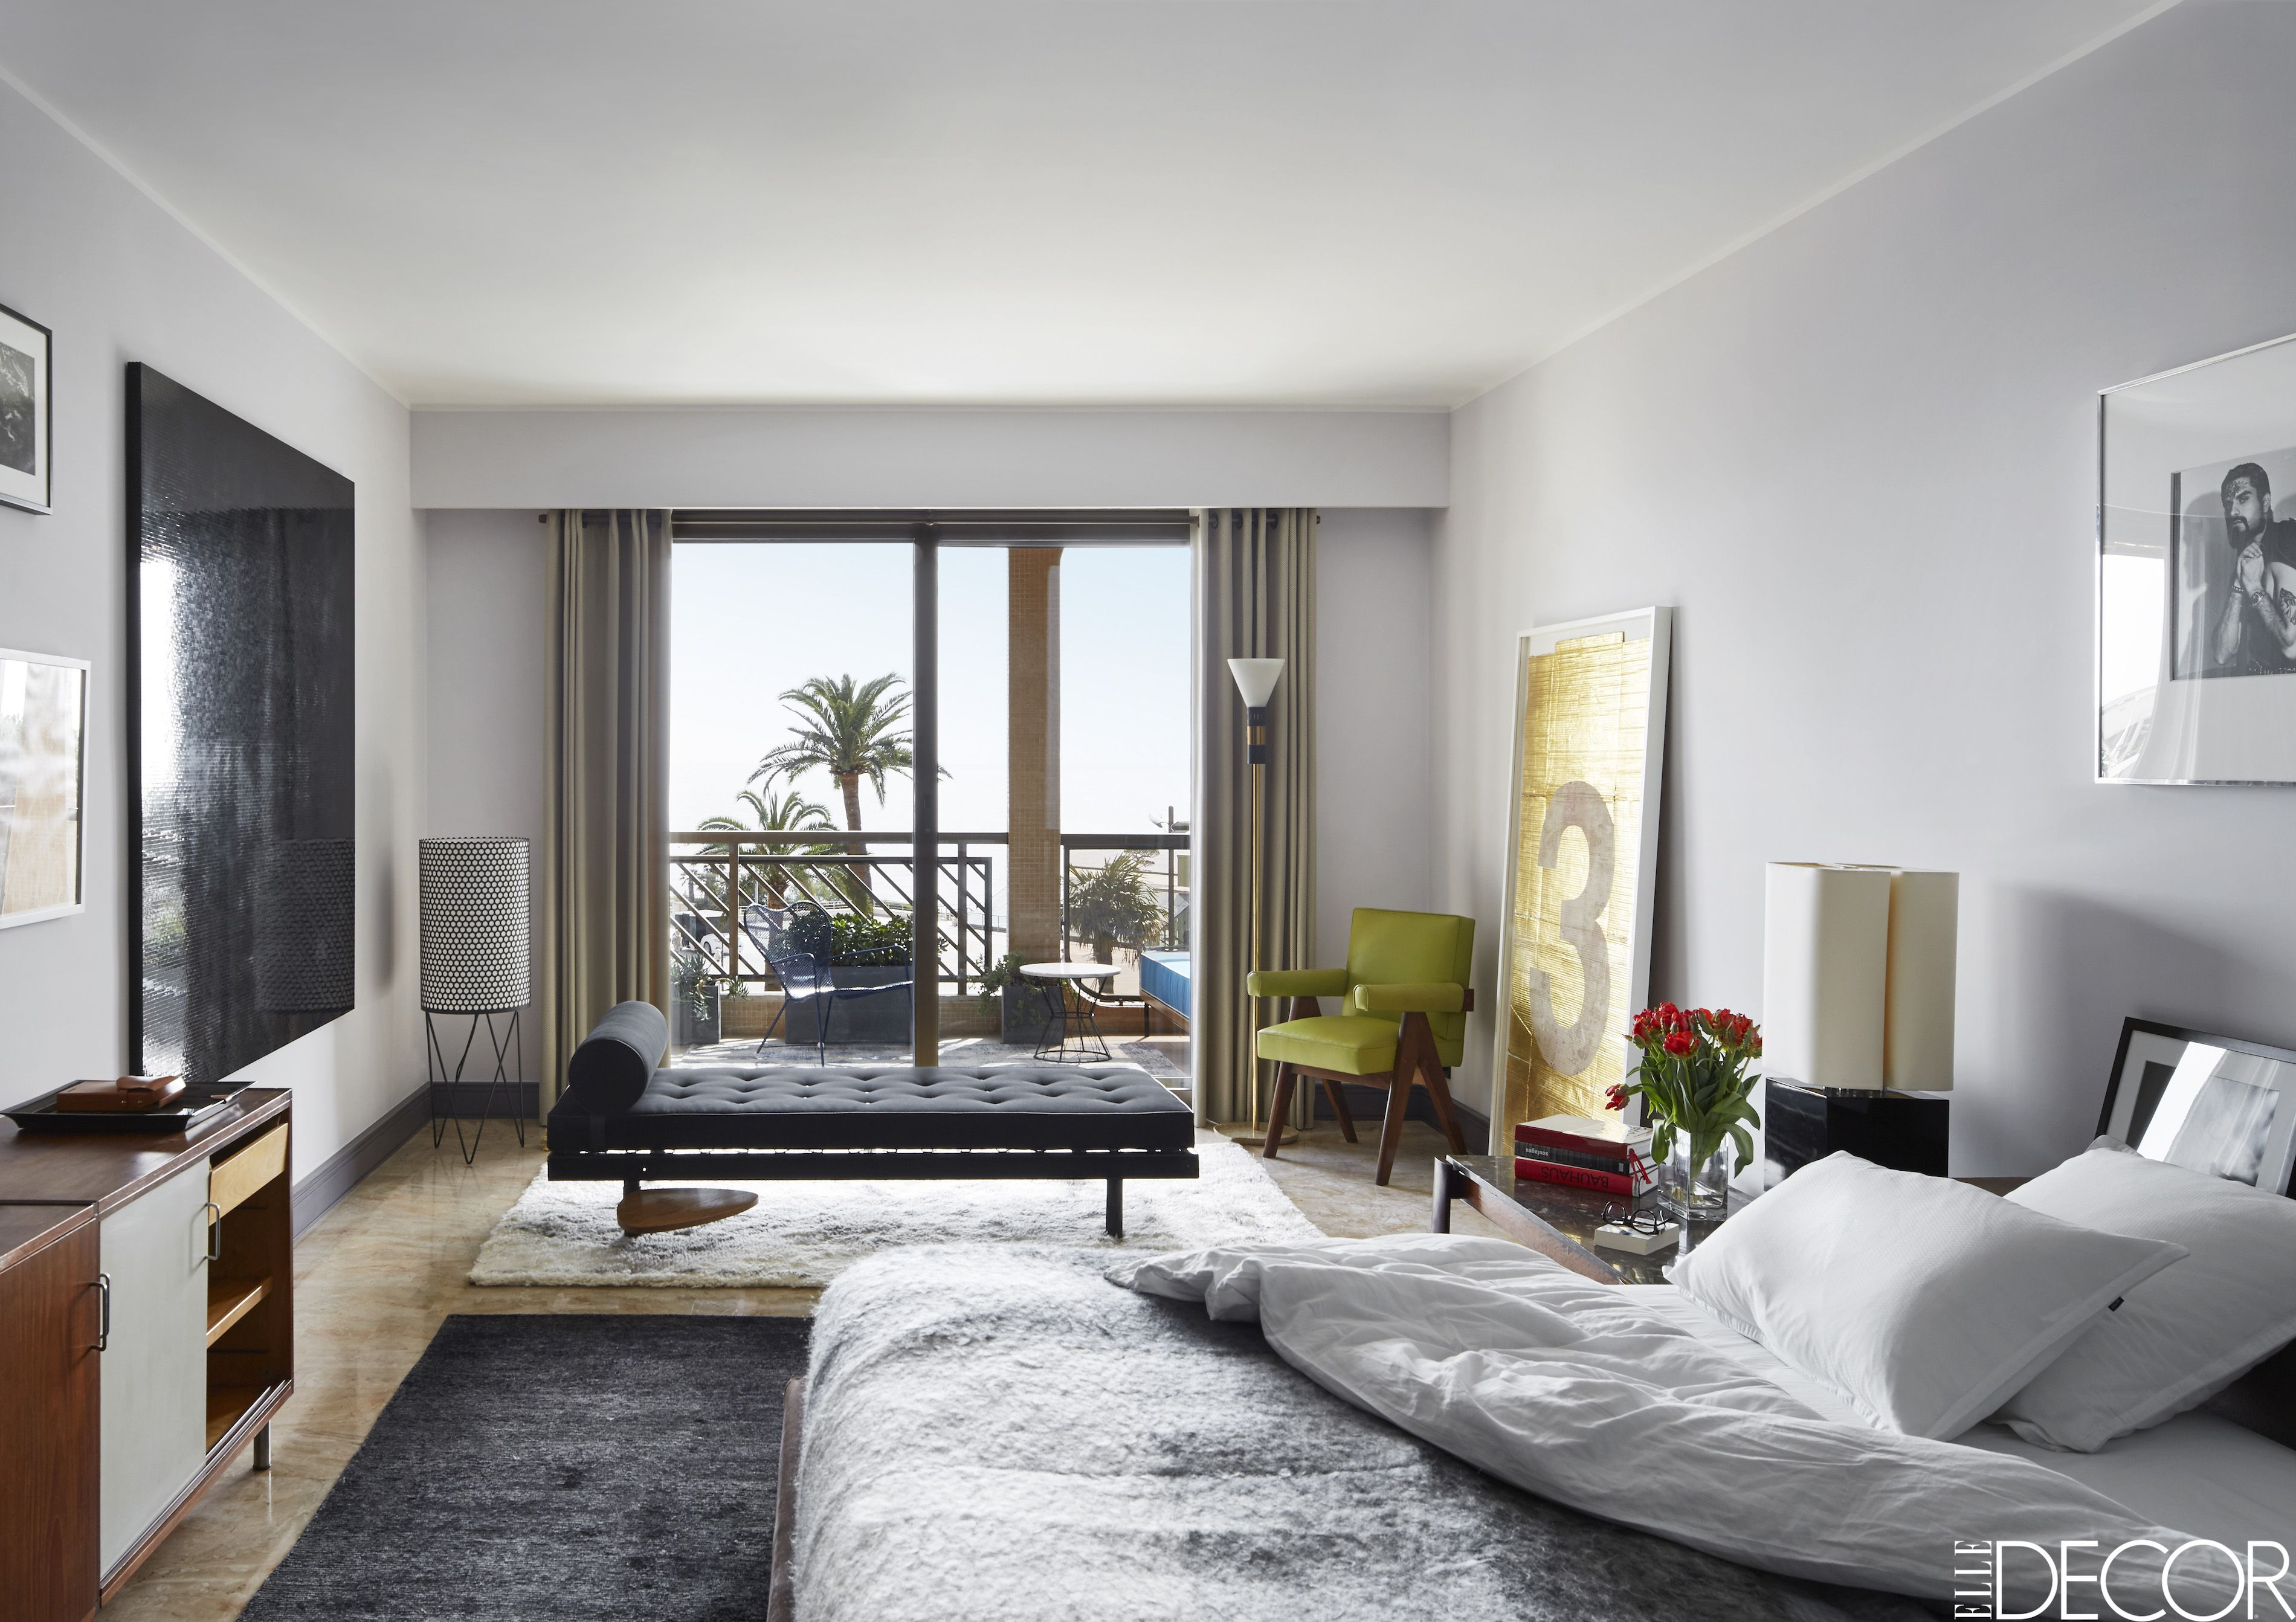 Wohndesign interieur badezimmer decorate bedroom  interior design for house  pinterest